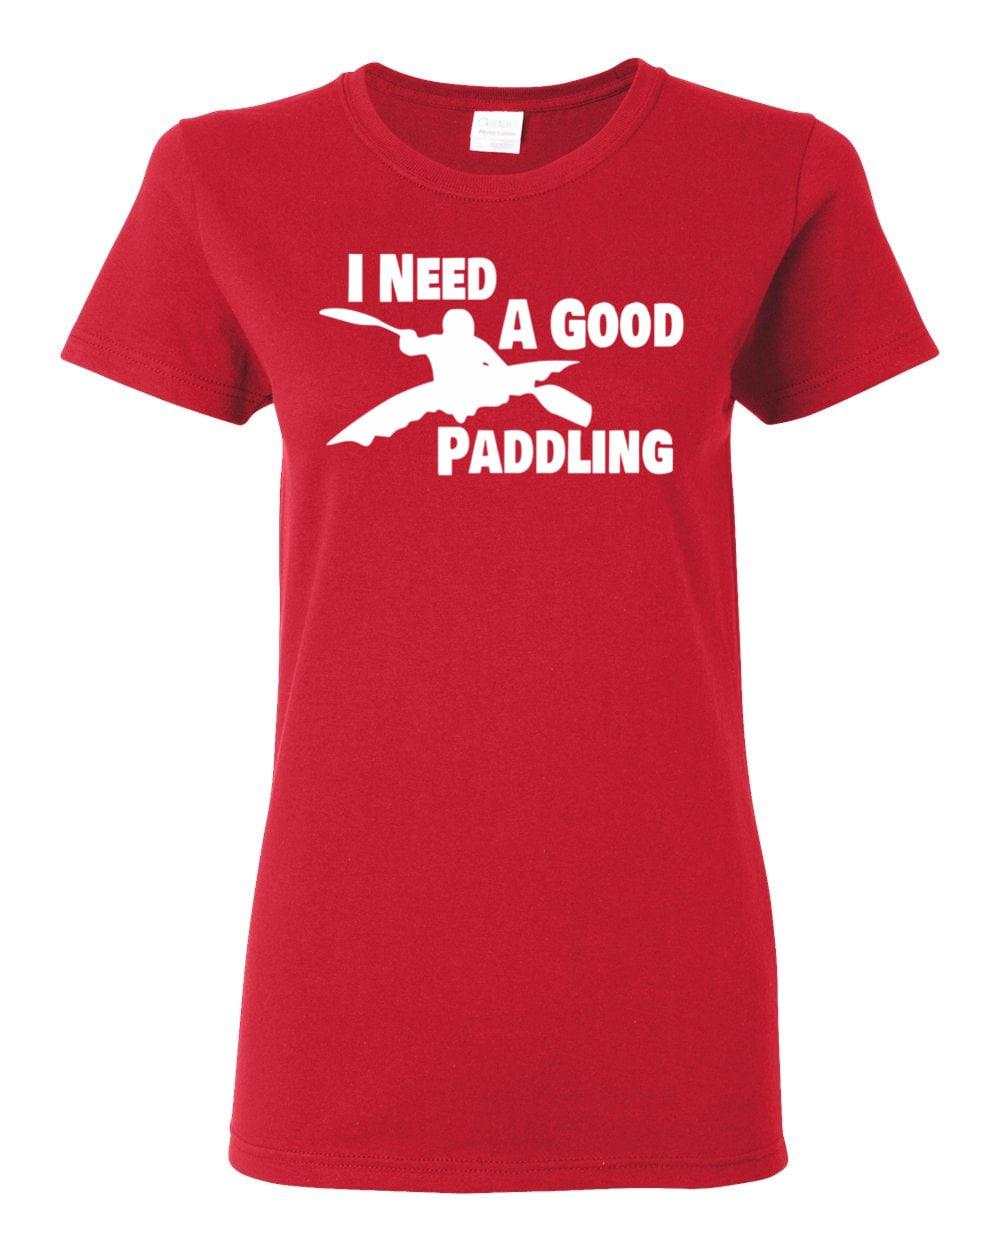 Kayak T-shirt - I Need A Good Paddling - Paddle Life Kayaking Womens T-shirt